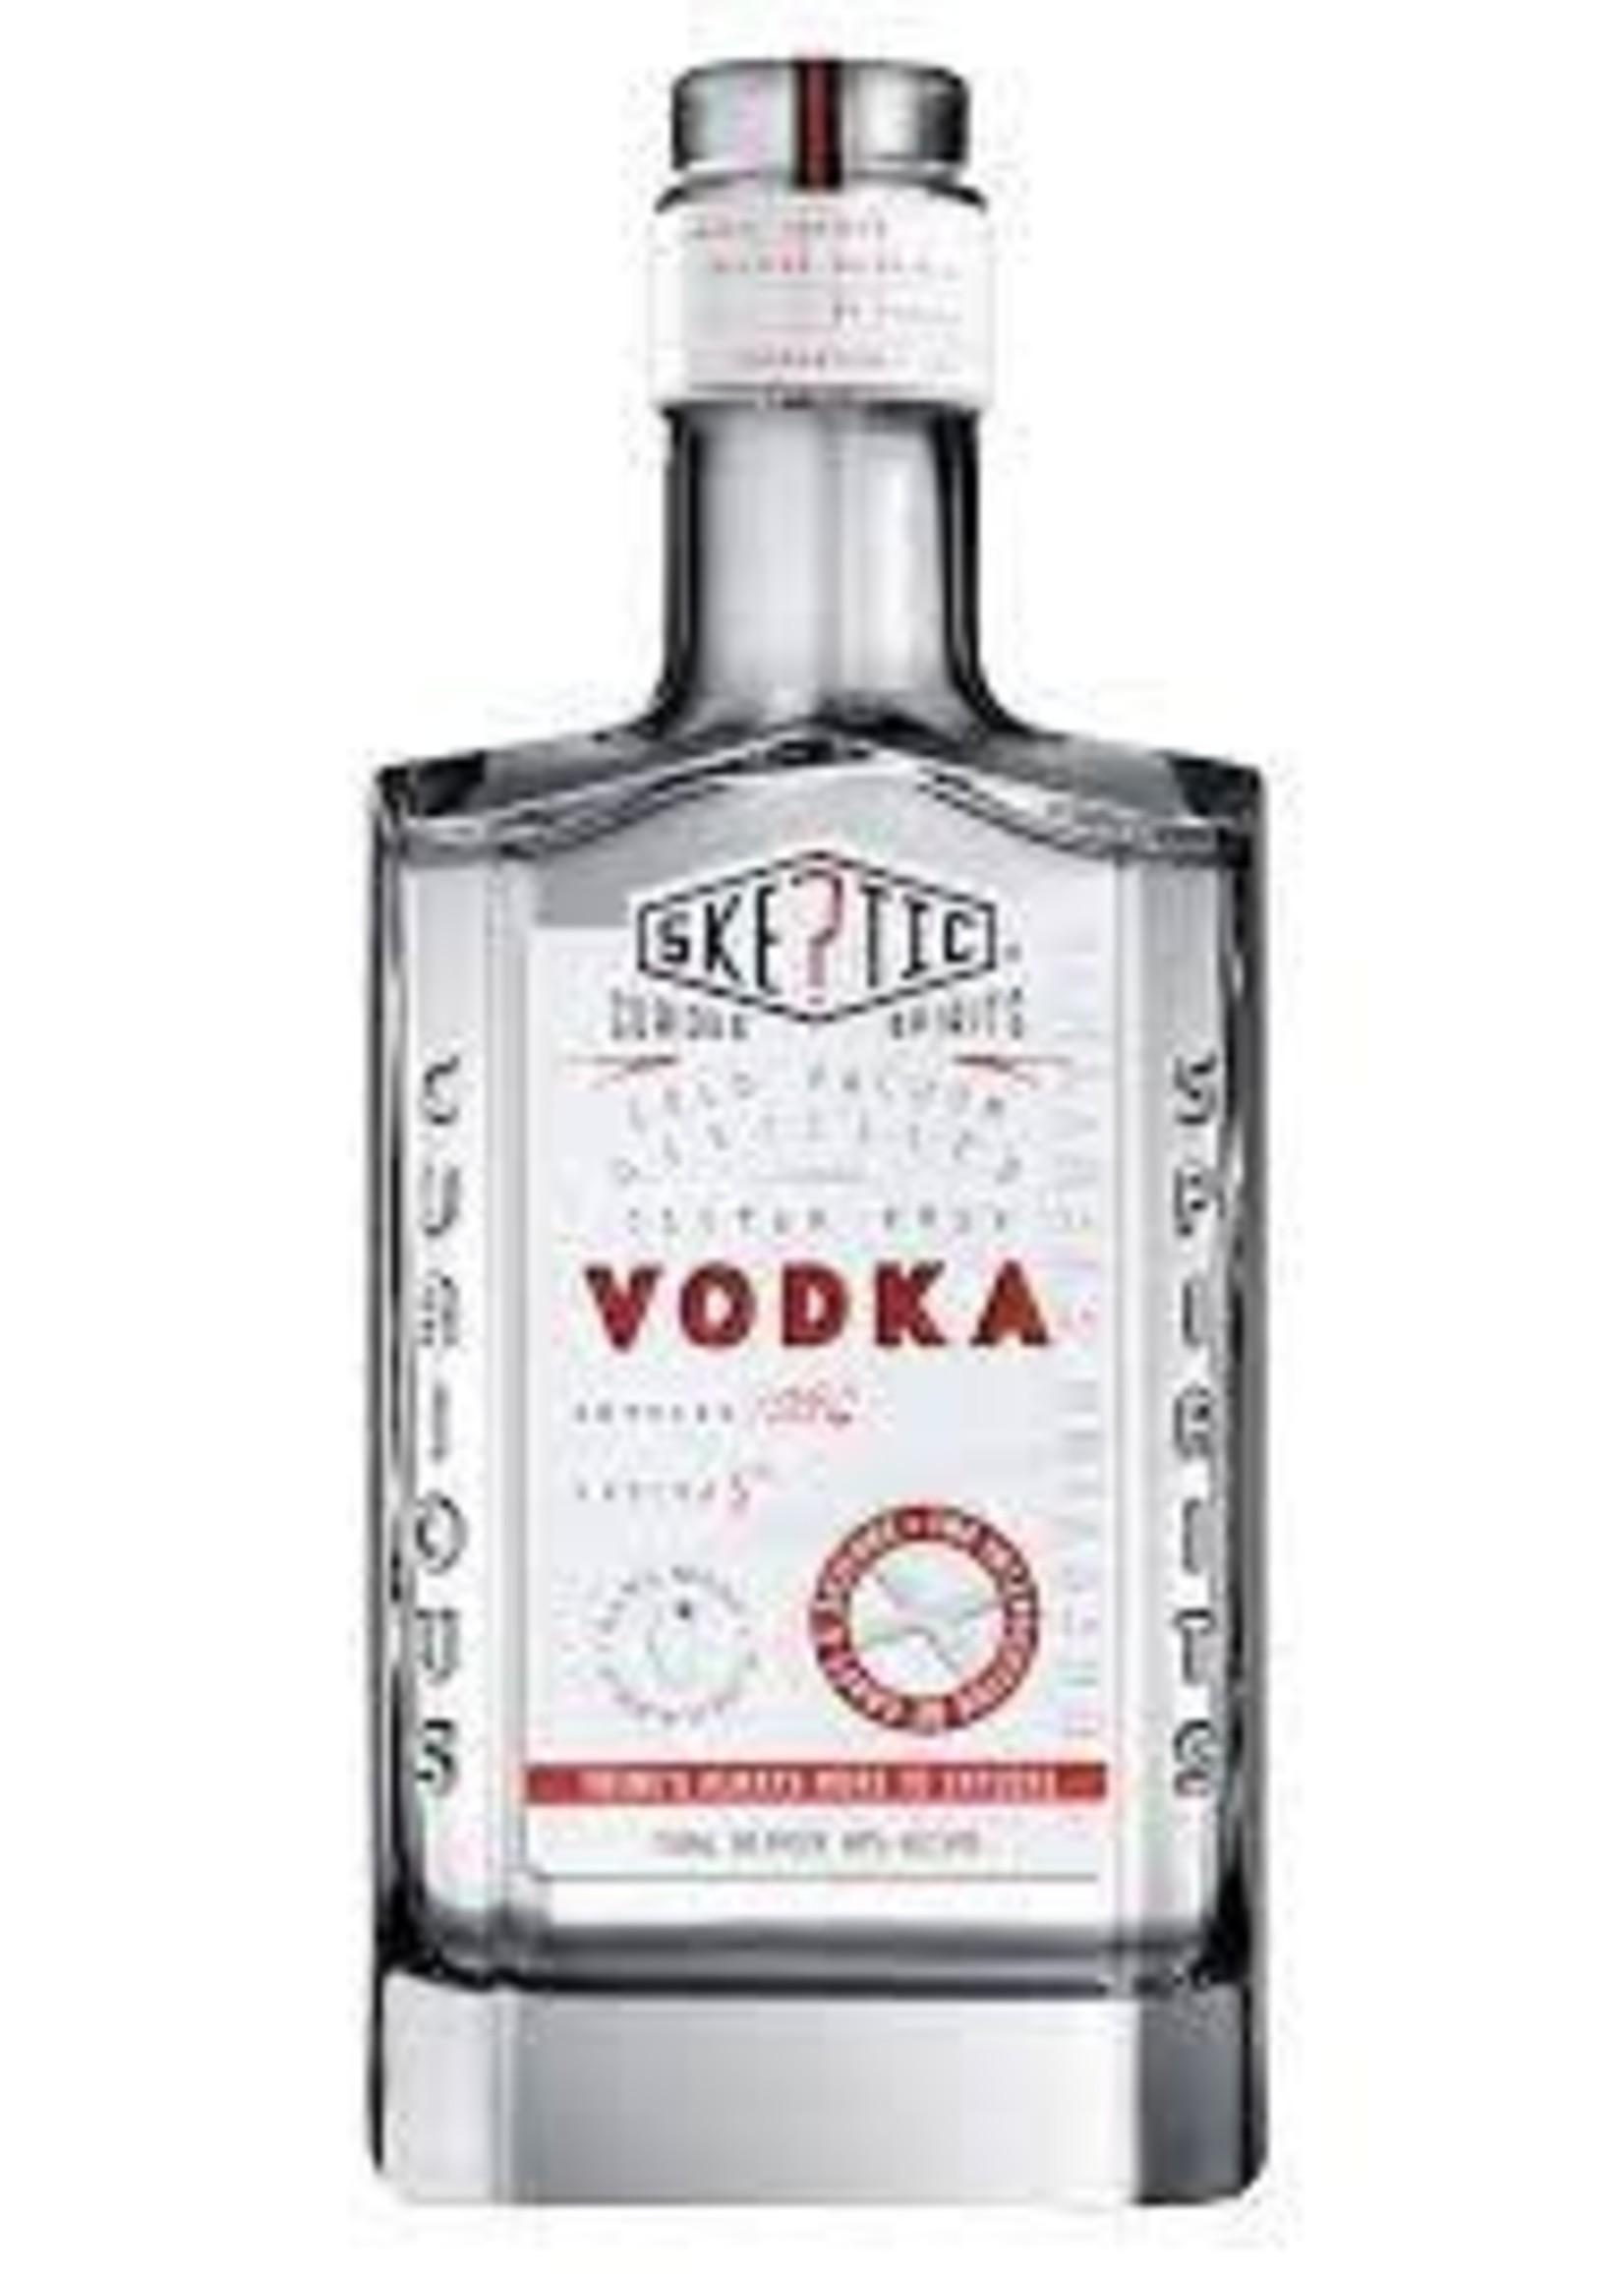 Skeptic Cold Vacuum Distilled Vodka 750ml